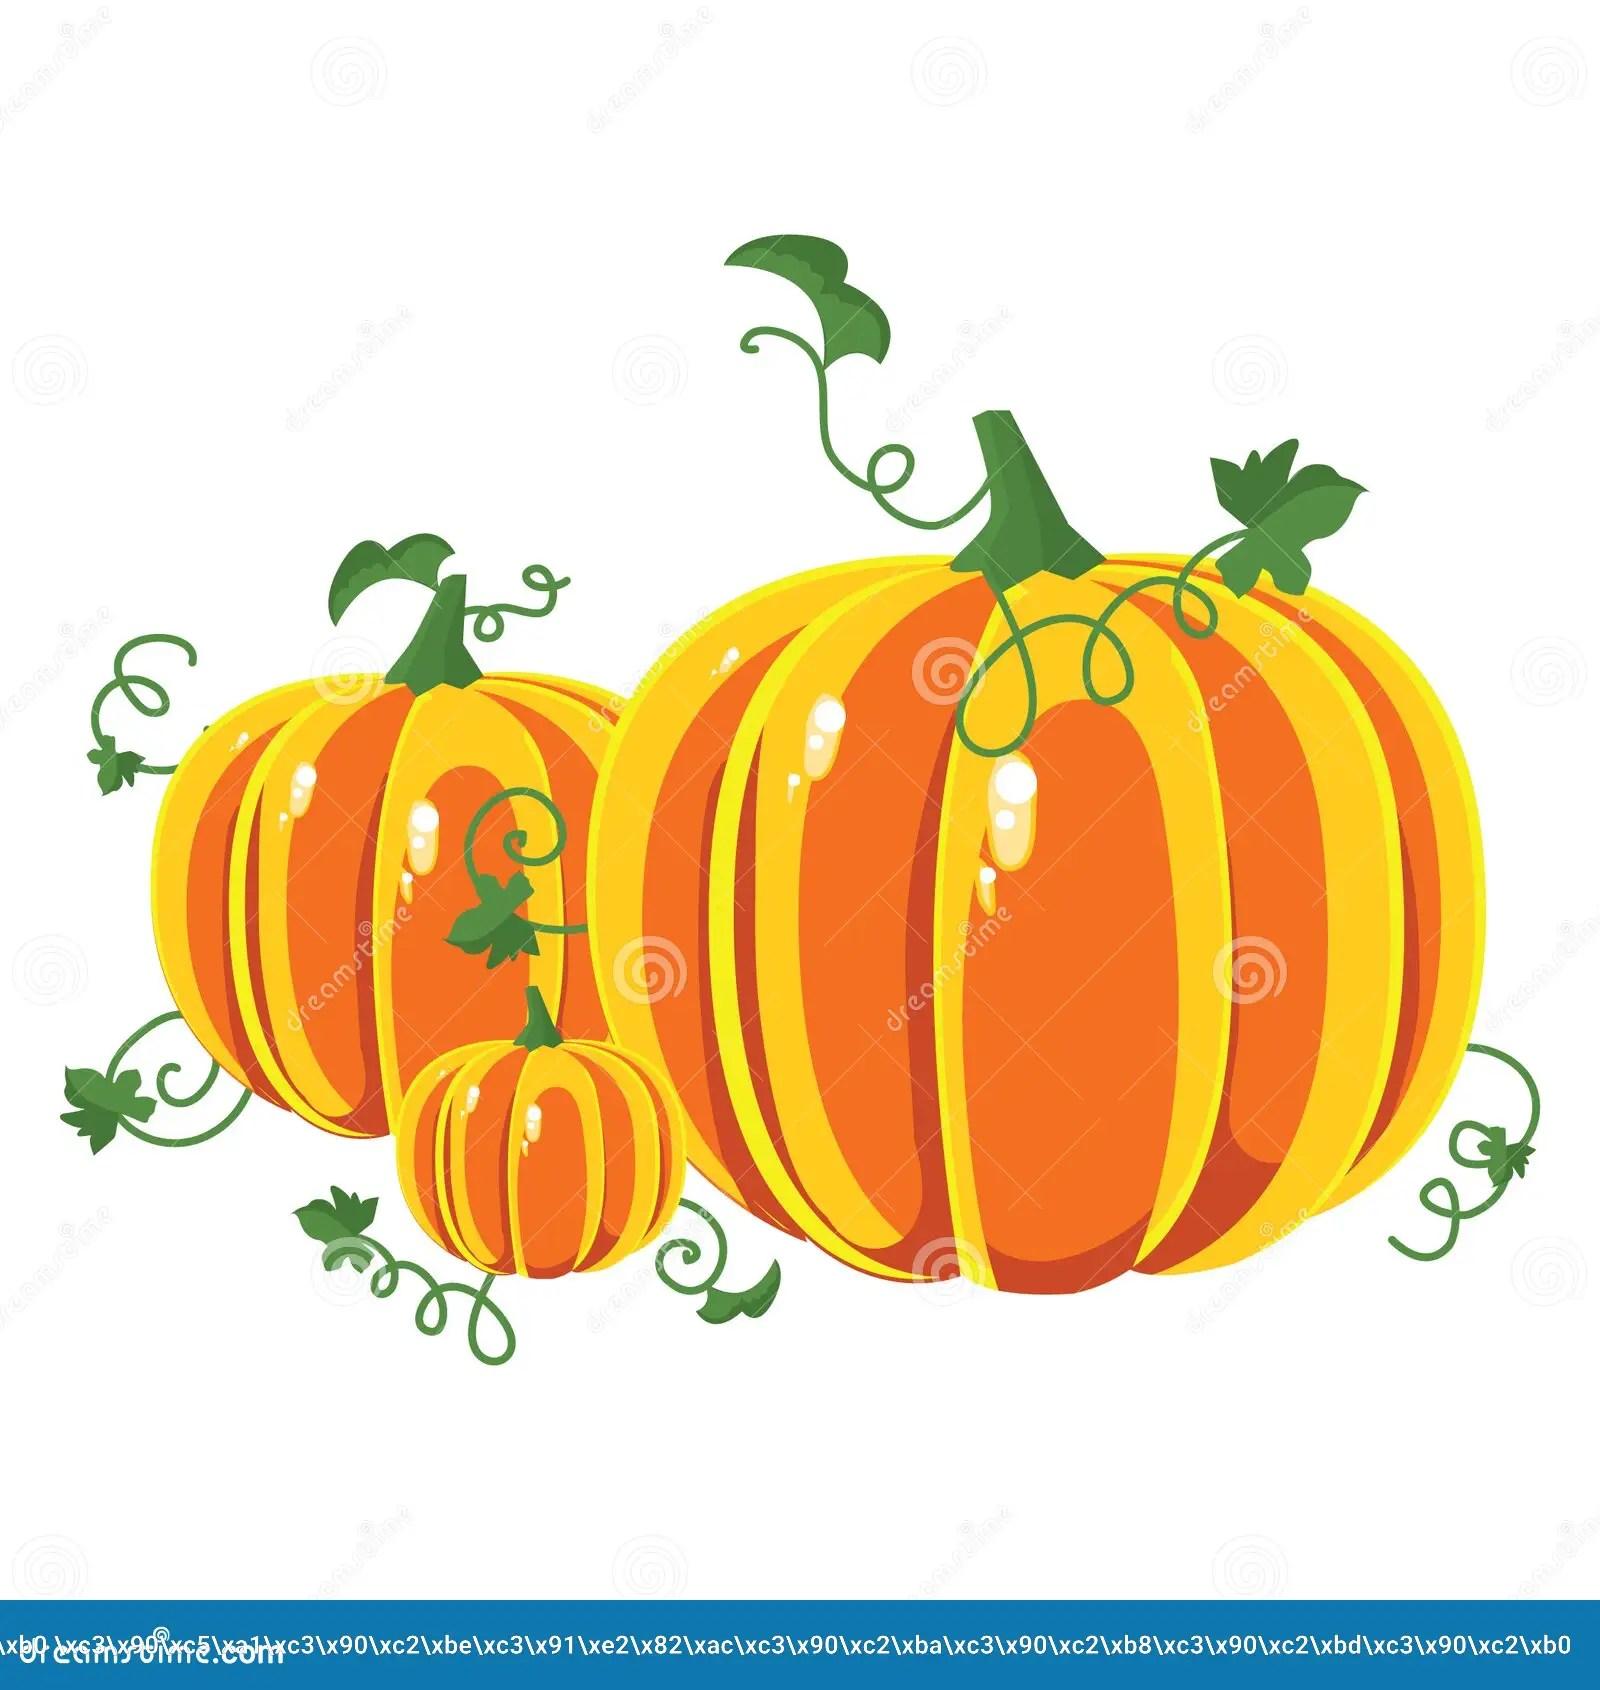 Free Fall Pumpkin Wallpaper Vector Pumpkins Three Pumpkins Of Different Sizes Royalty